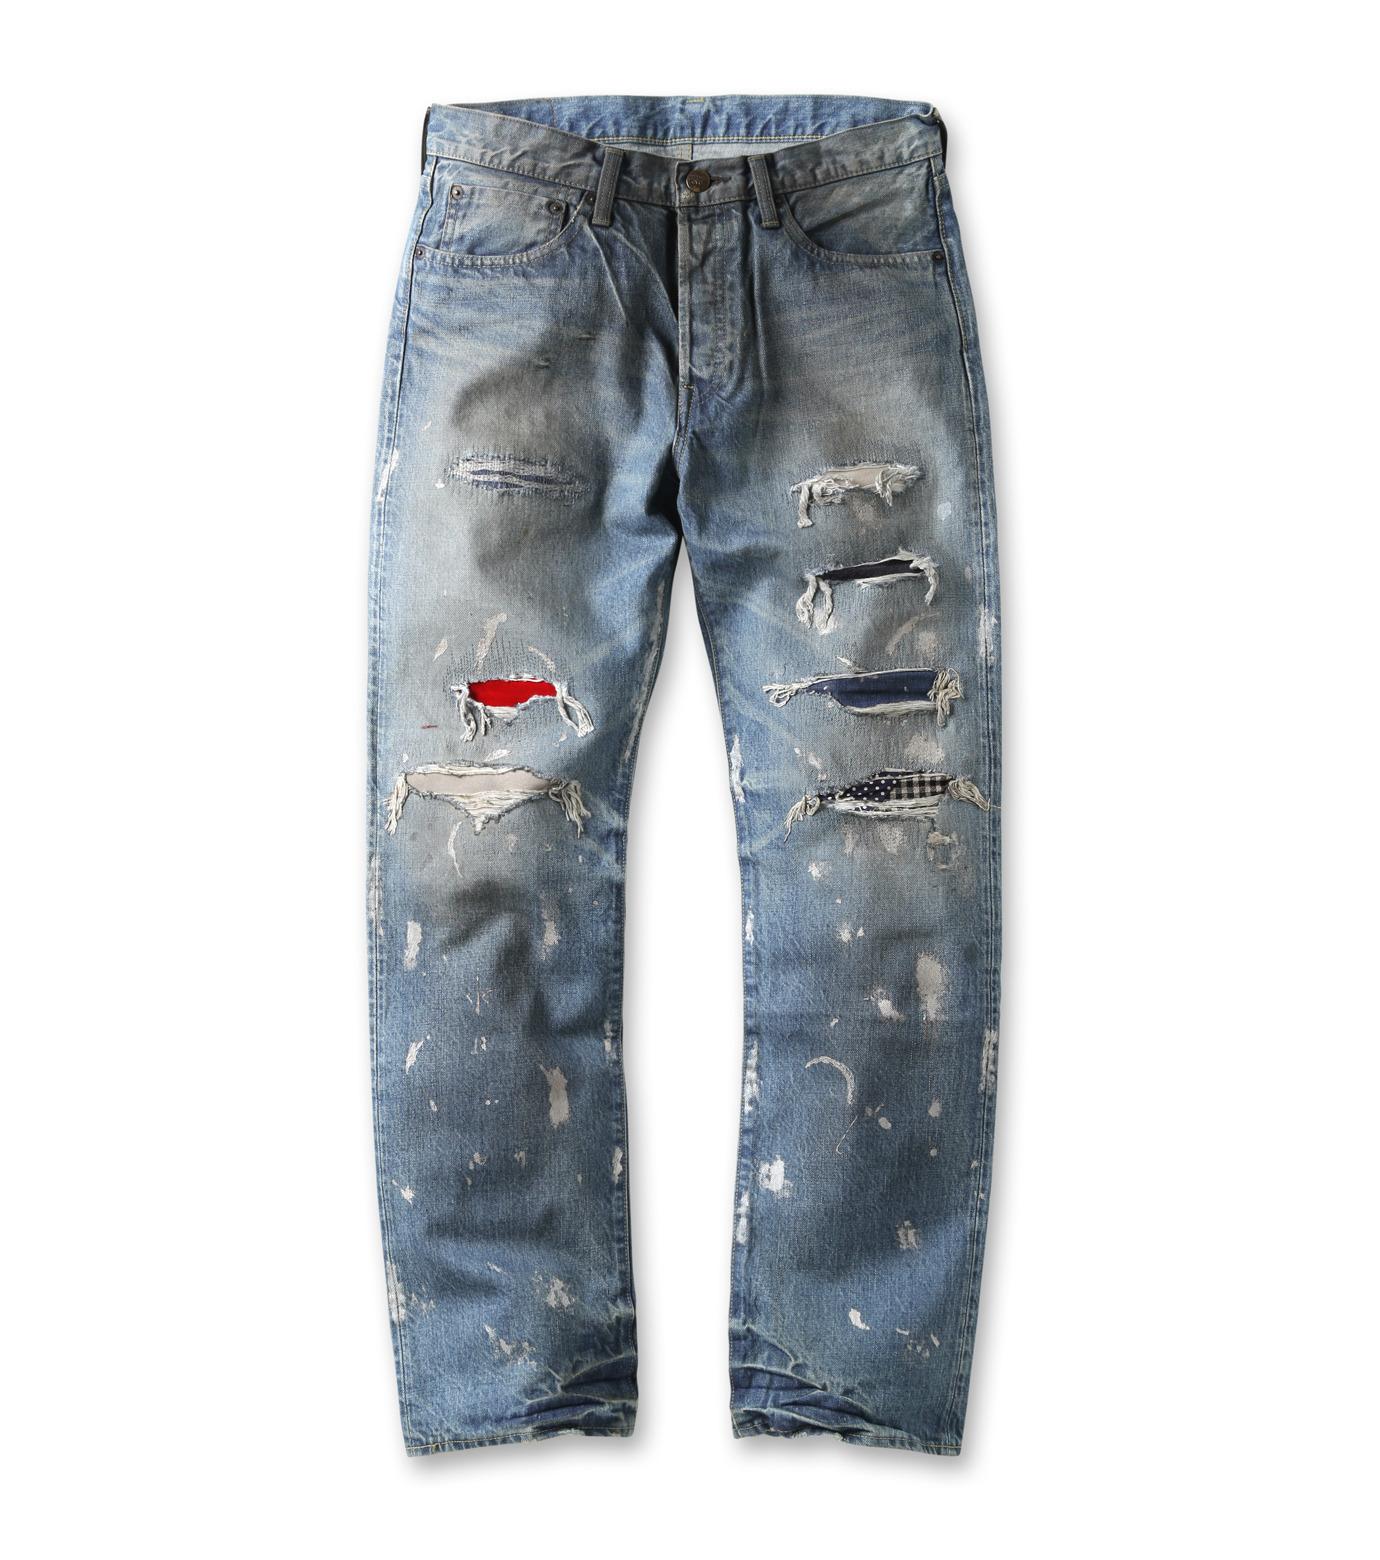 Heddie Lovu(エディー ルーヴ)のMAHOGANY LGT-SP1-LIGHT BLUE(パンツ/pants)-MAH-LGT-SP1-91 拡大詳細画像1